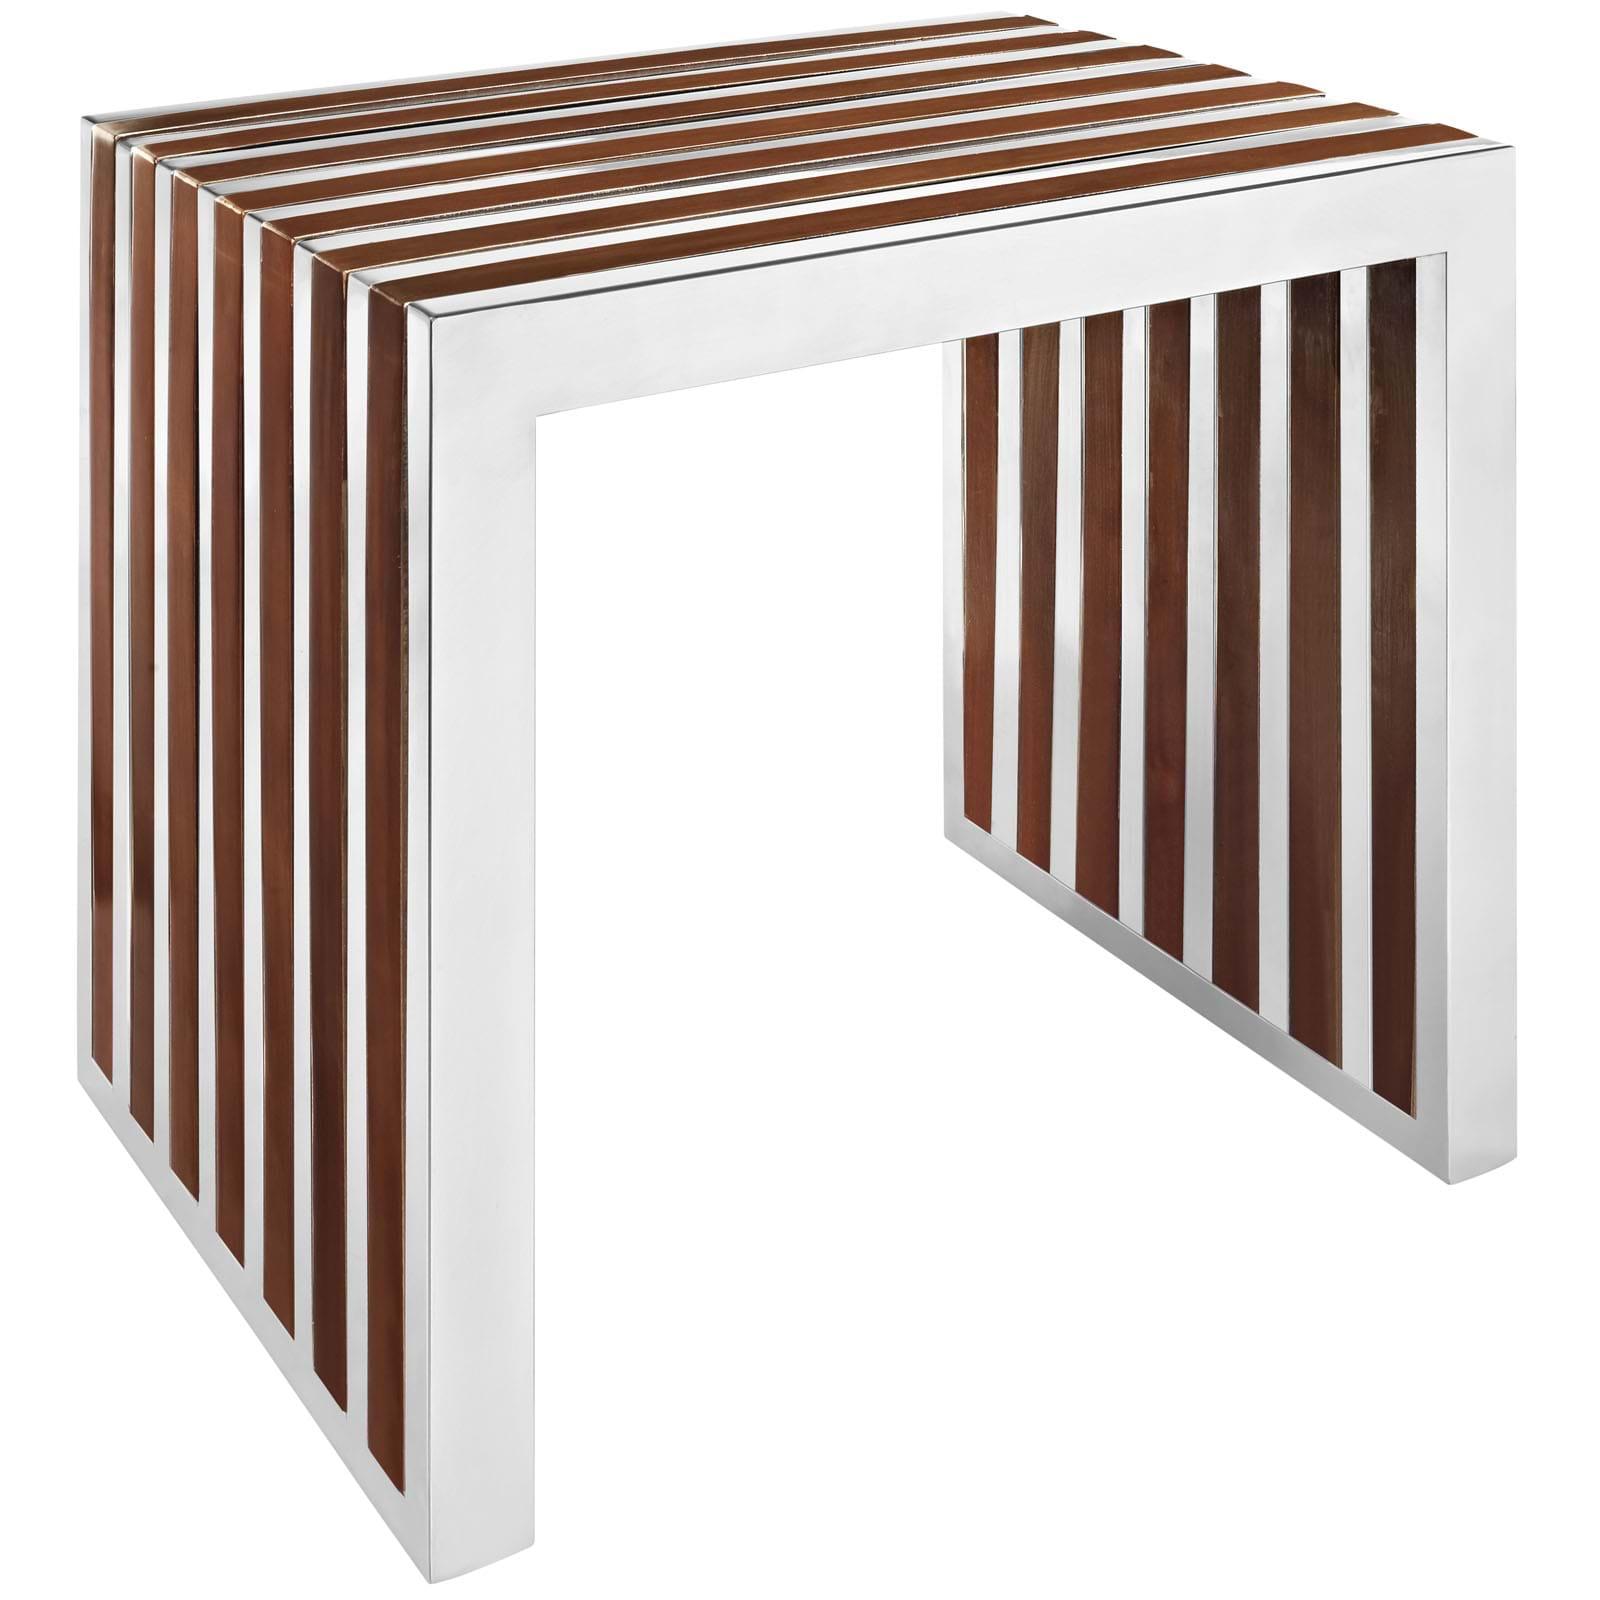 Gridiron Small Wood Inlay Bench